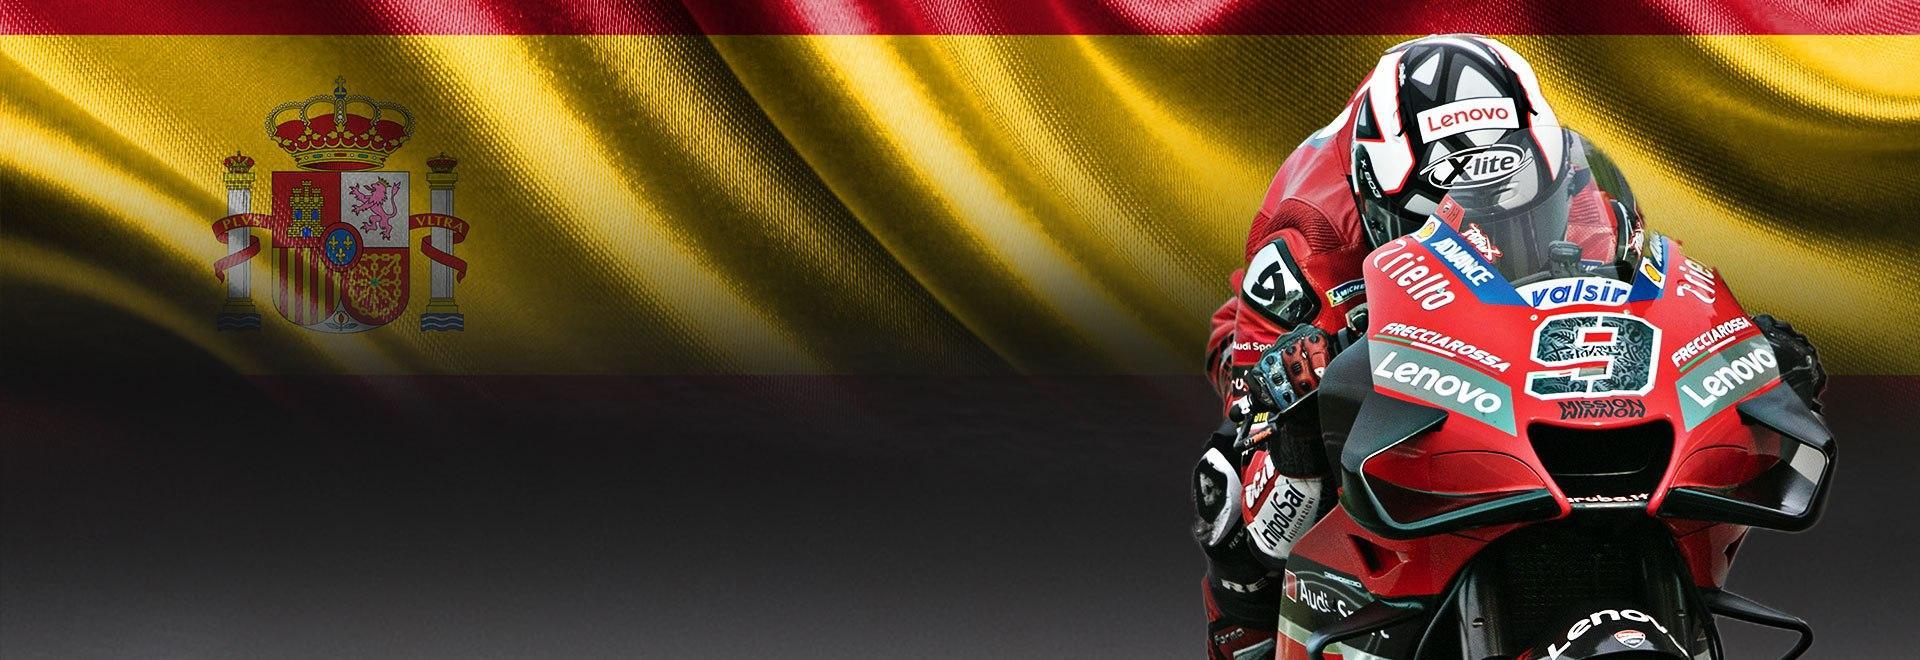 GP Spagna. PL4